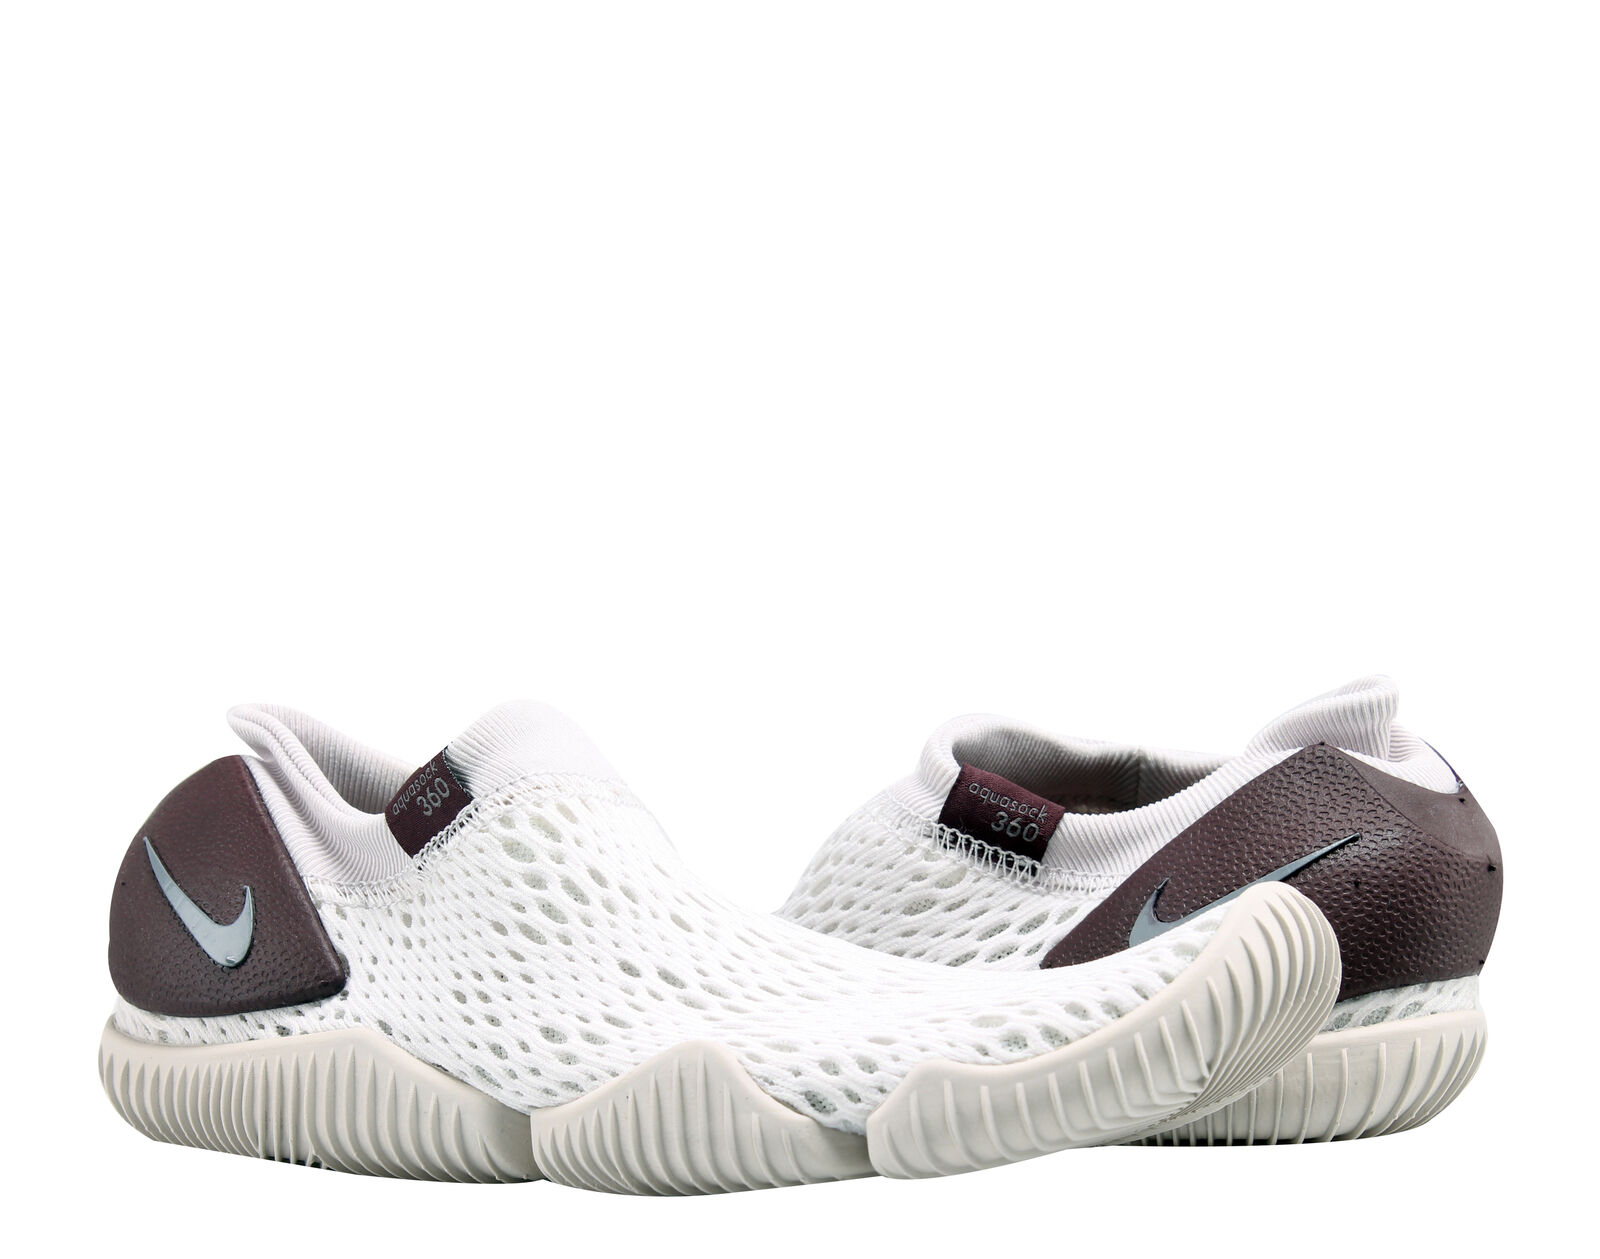 Nike Aqua Sock 360 Vast Grey/Gunsmoke Men's Water Shoes 885105-004